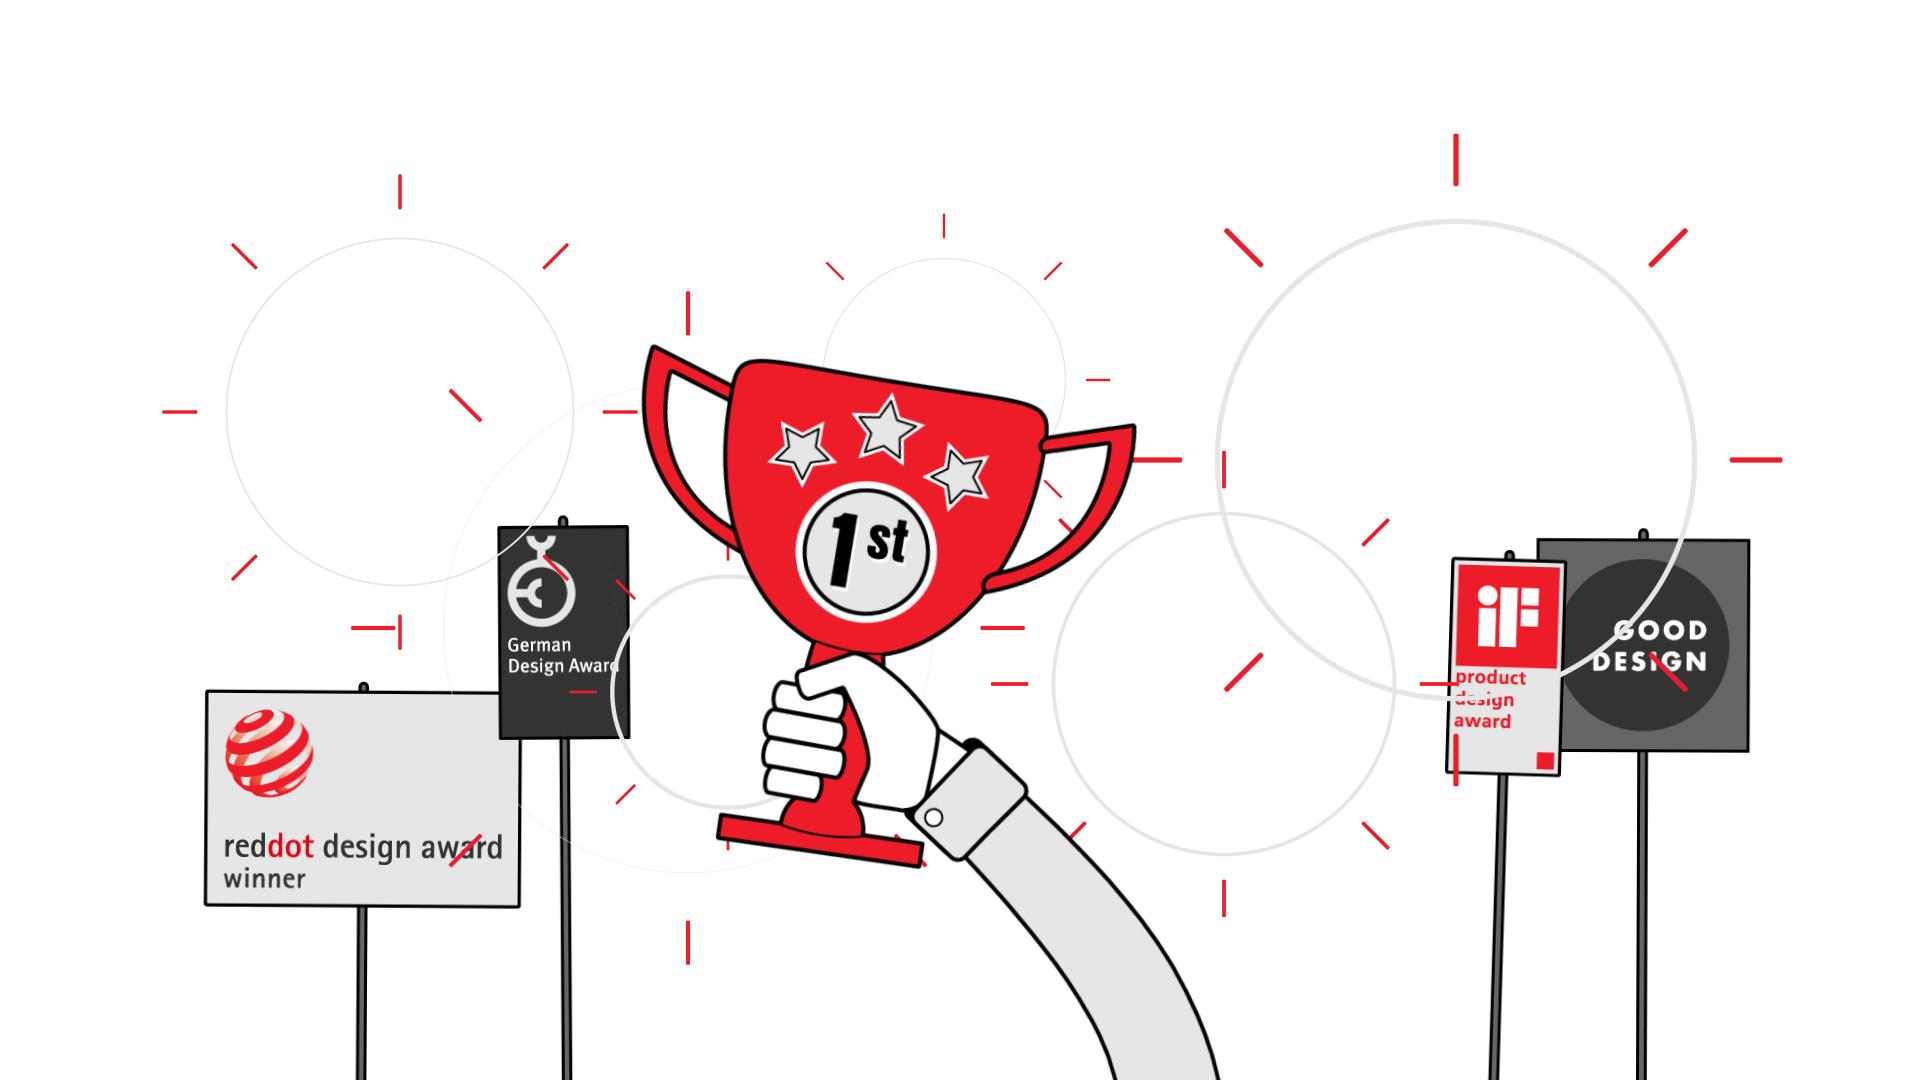 item24 – aluminium profile animation award